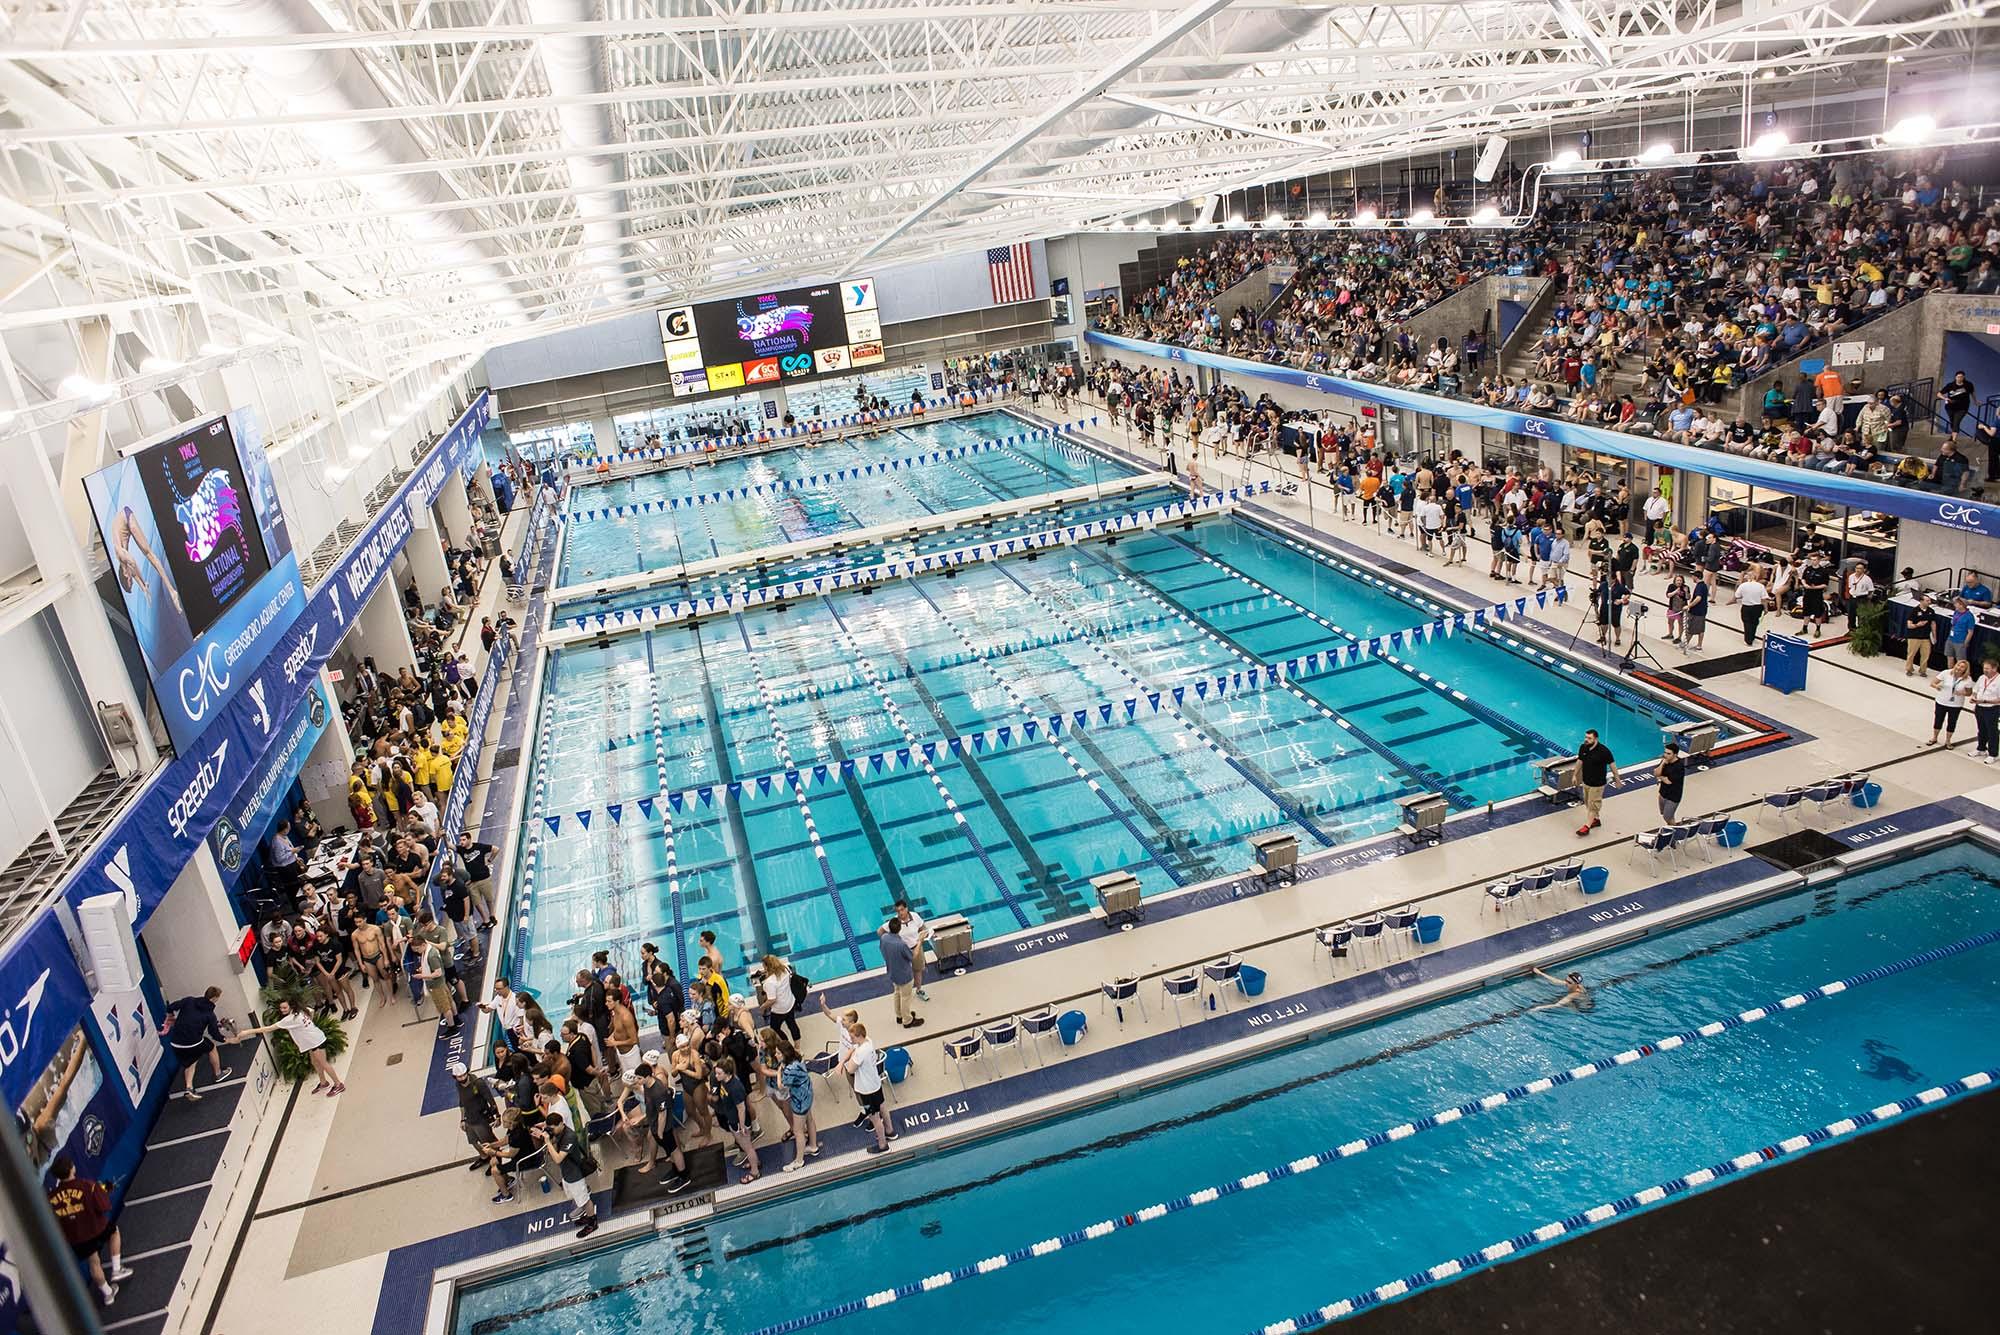 Greensboro Aquatic Center, State of the art Aquatic Facility